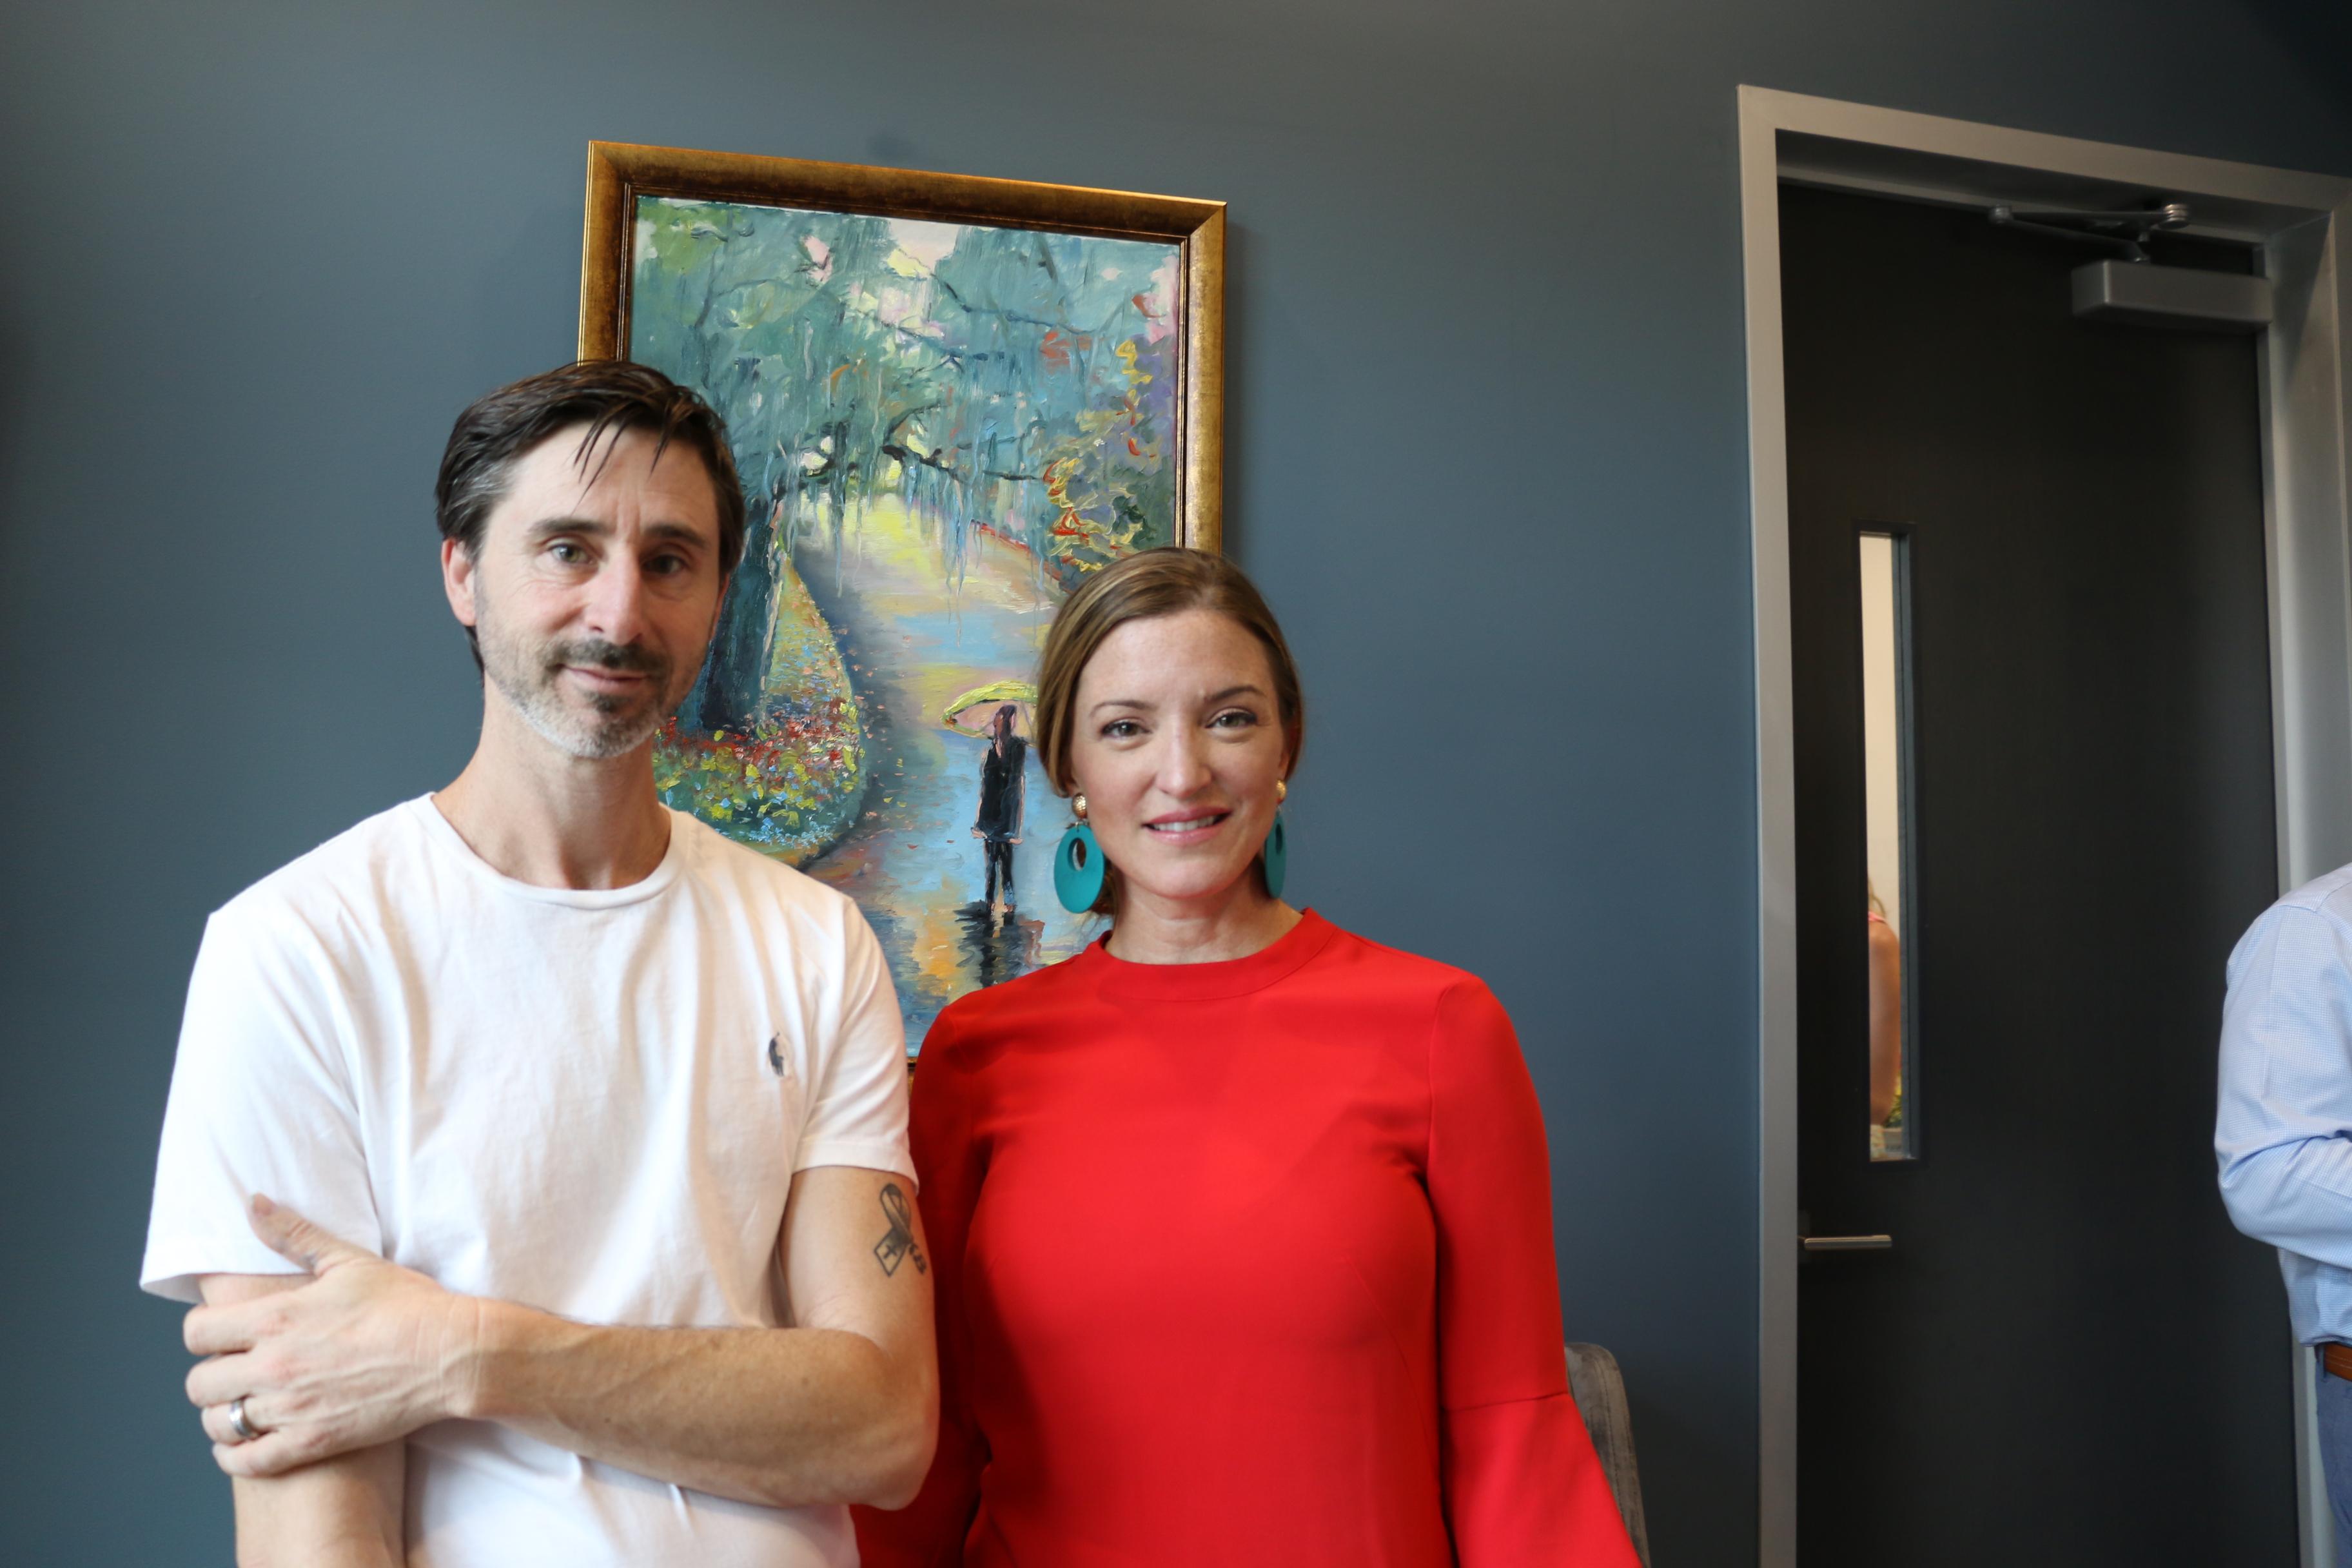 Artist Brian Benson and Interior Designer Molly Eileen Bean enjoy the festivities.